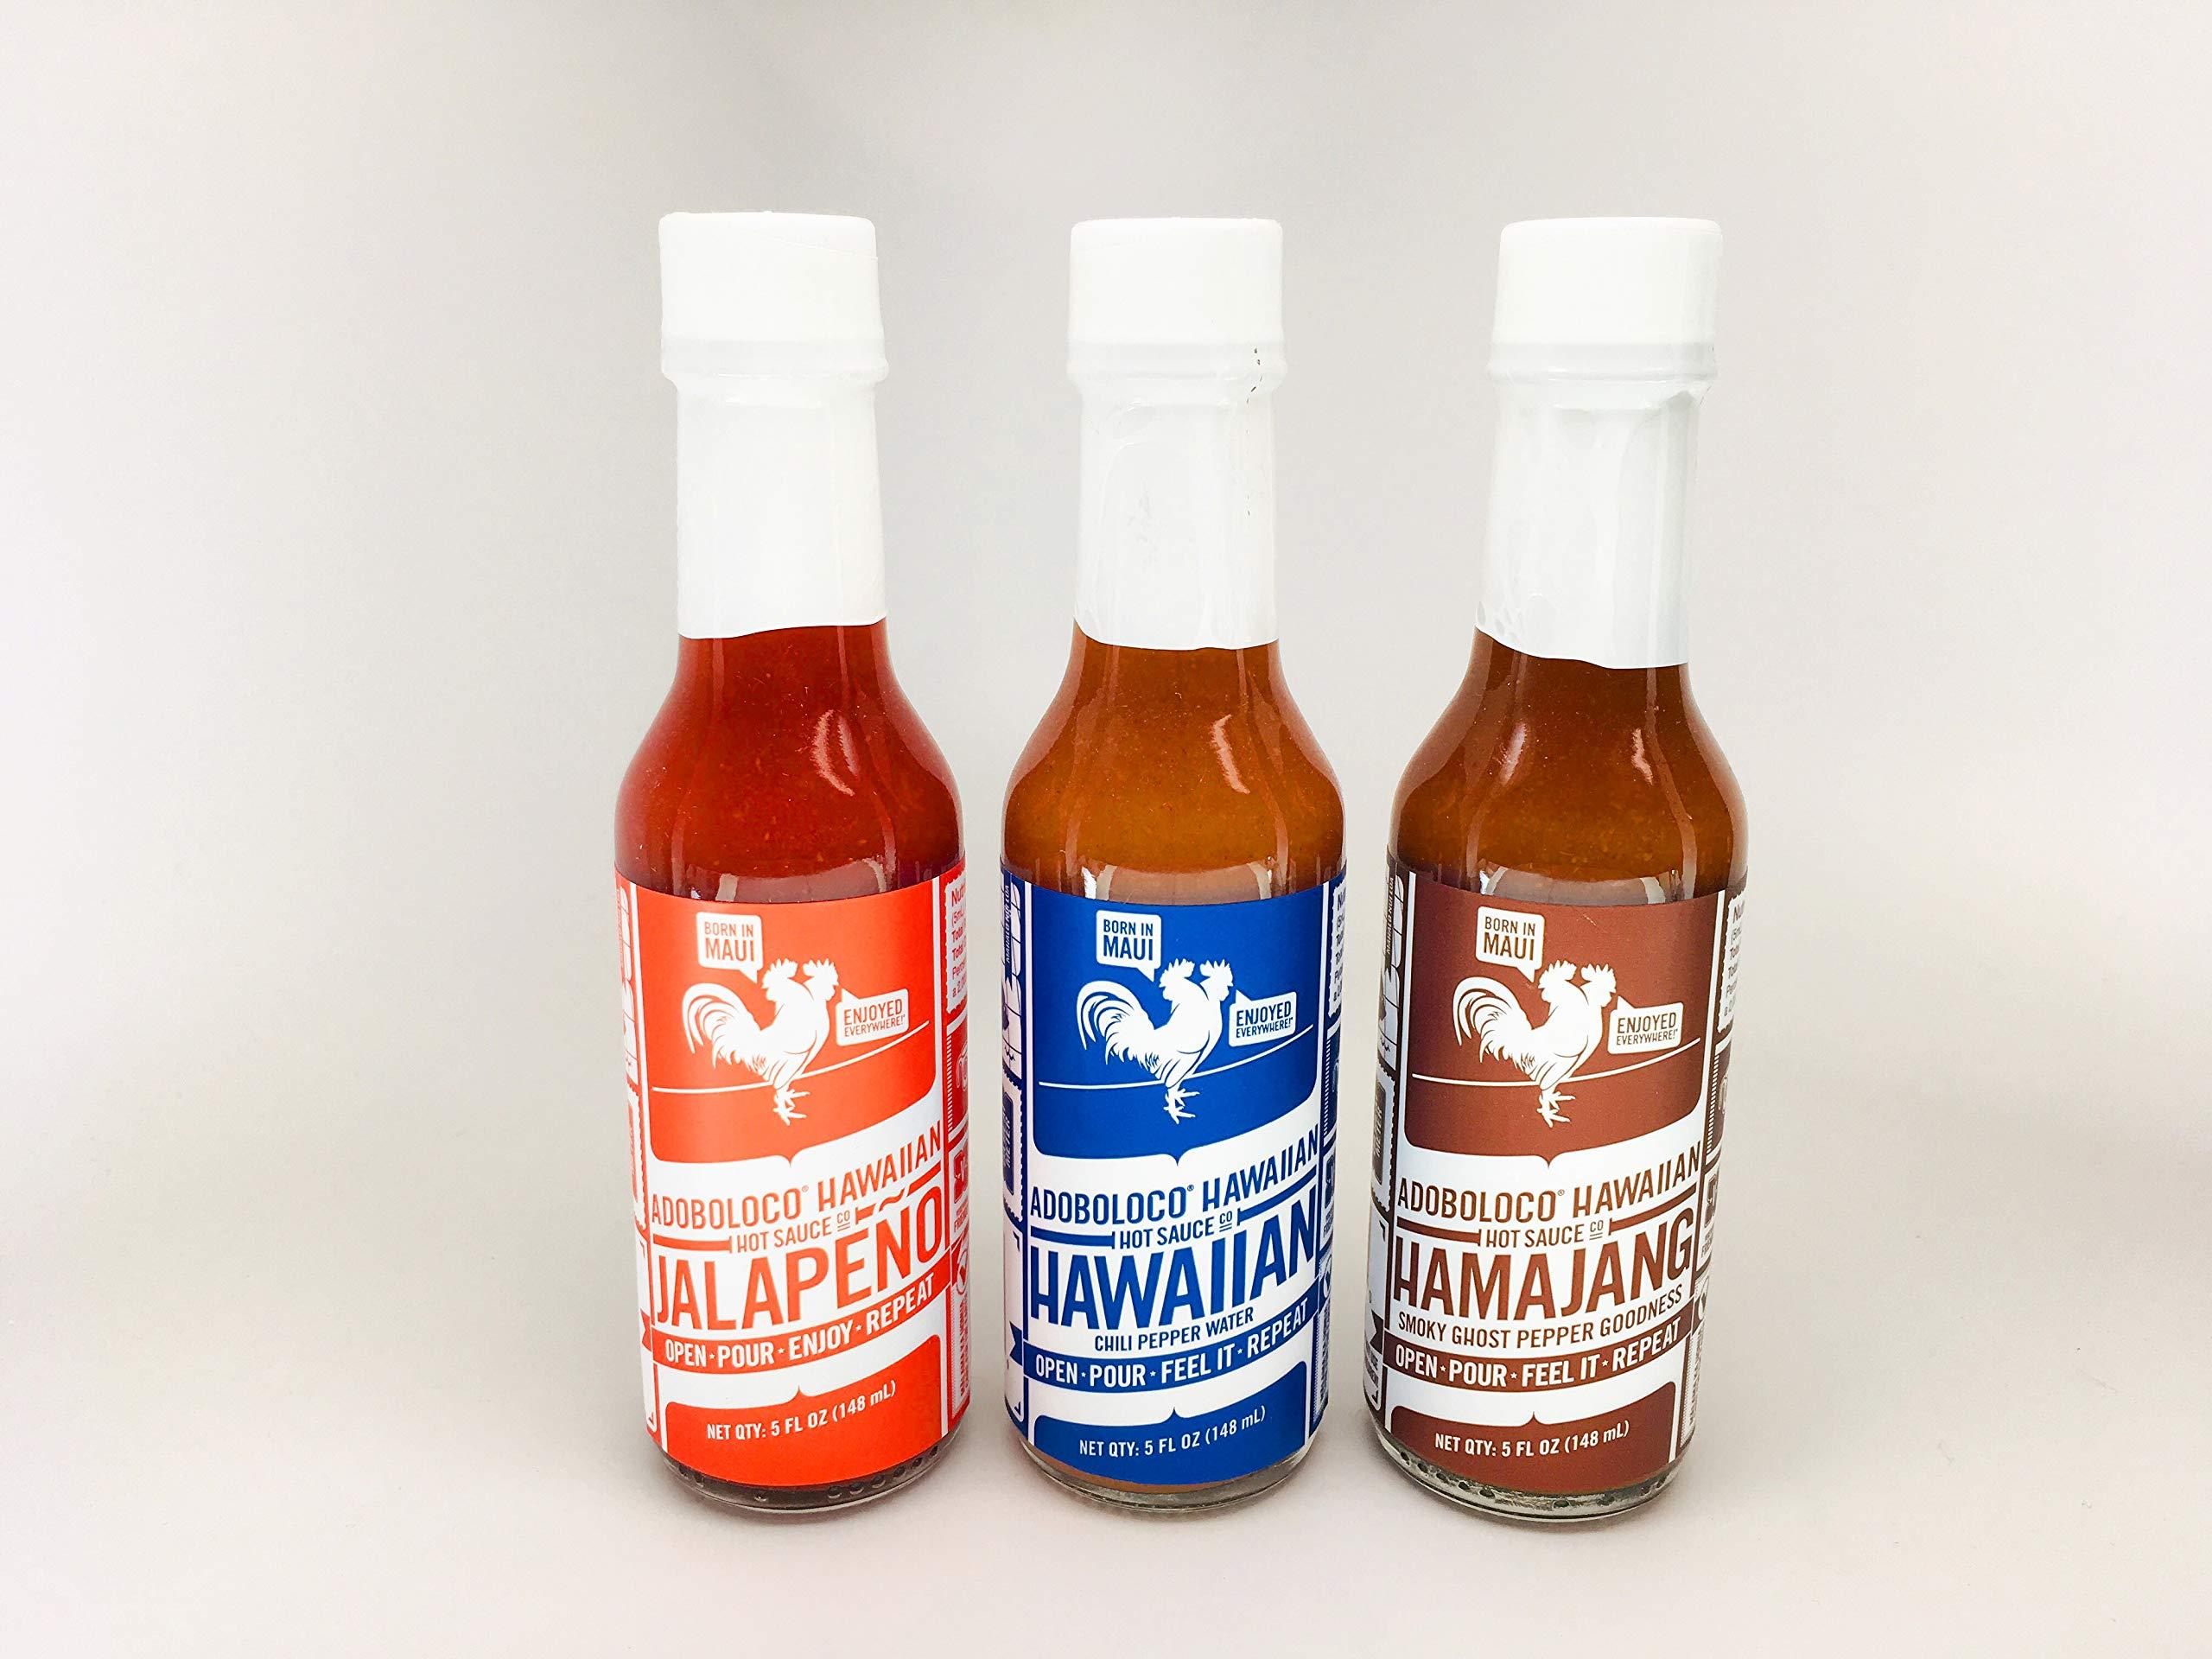 Adoboloco Jalapeño, Hawaiian, Hamajang Smoked Ghost Pepper - Adoboloco Hot Sauce - 3, 5oz Bottle Variety Pack